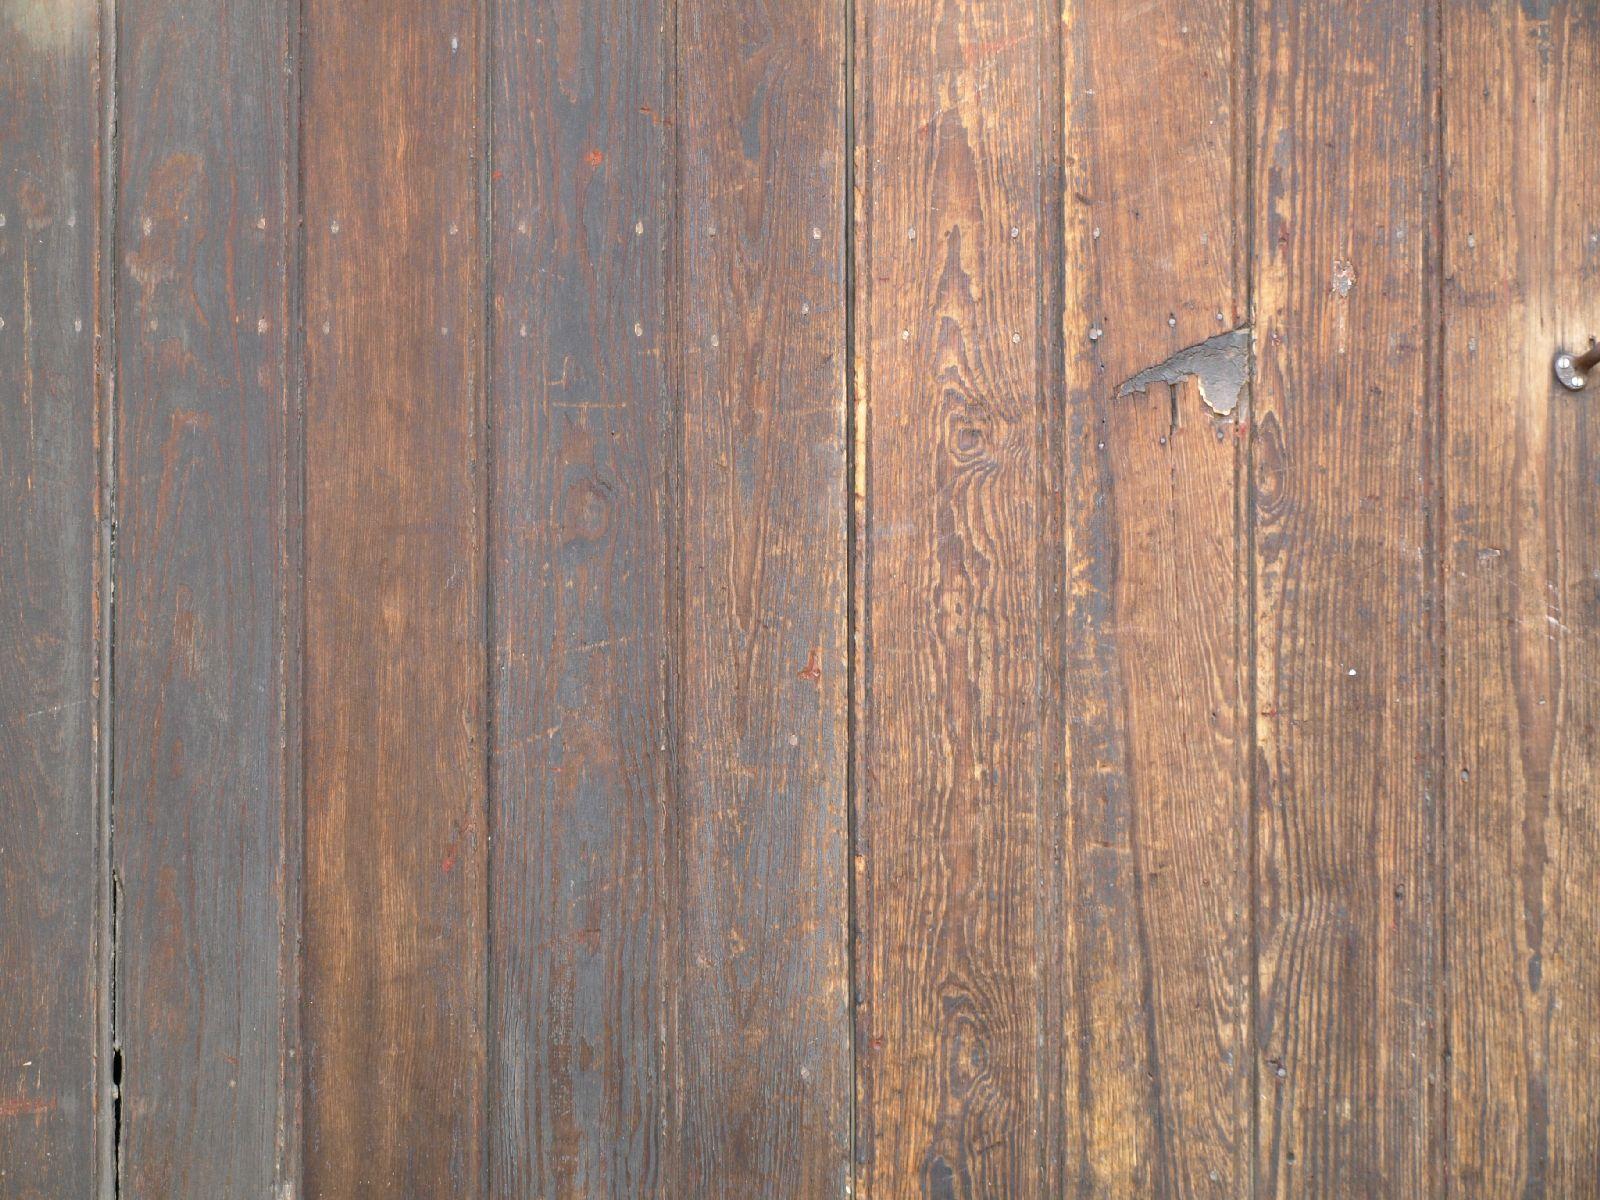 Wood_Texture_A_P4080229